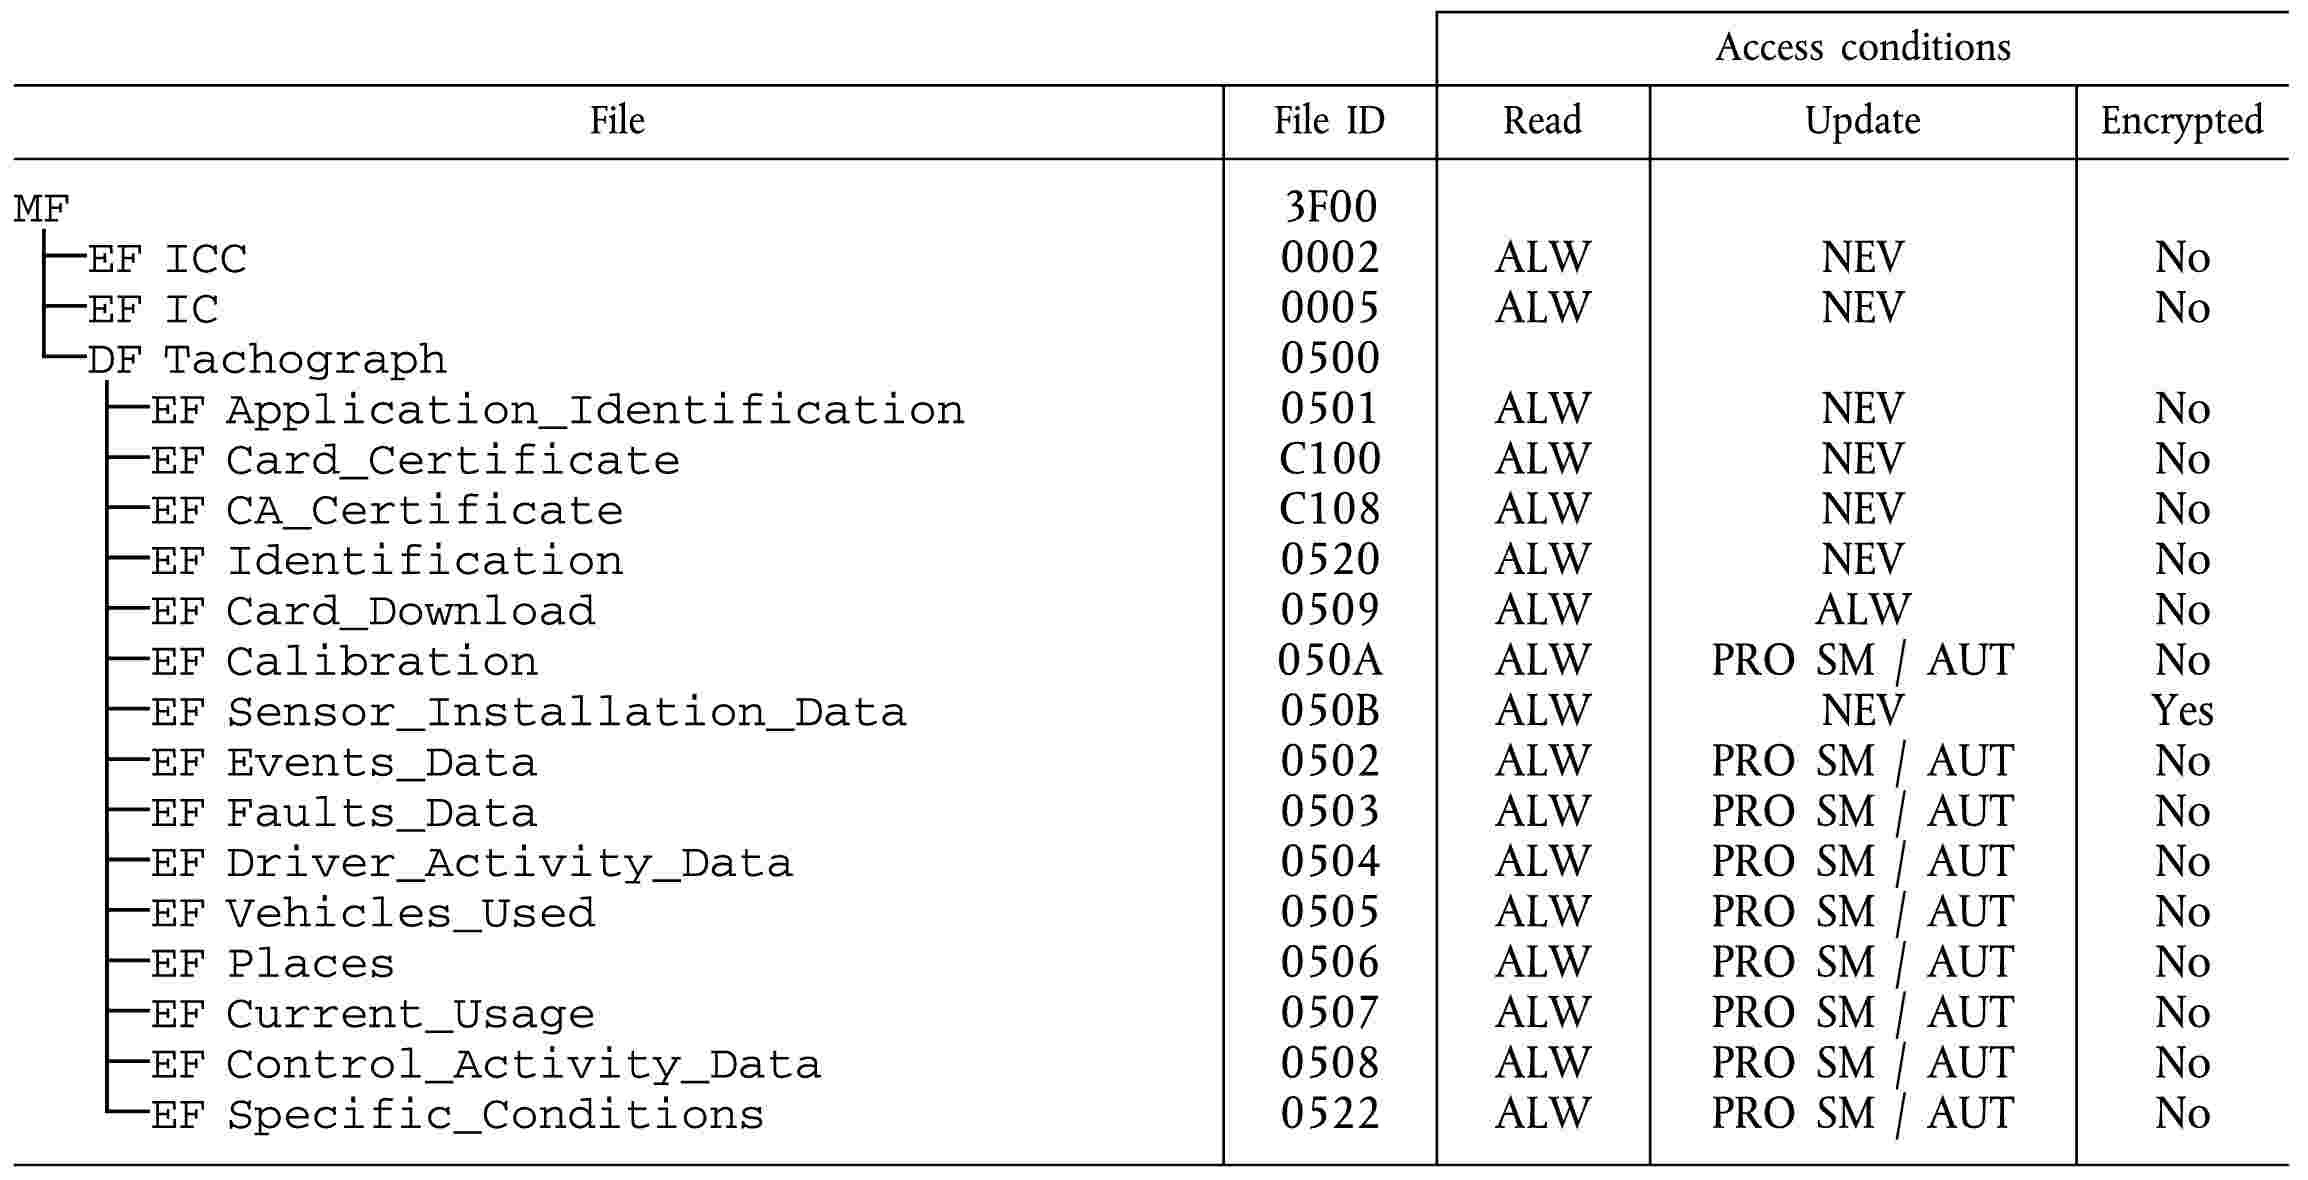 March Calendar 1999 Más Arriba-a-fecha Eur Lex R3821 En Eur Lex Of March Calendar 1999 Más Recientes Wo A2 Networked Interactive toy System Google Patents